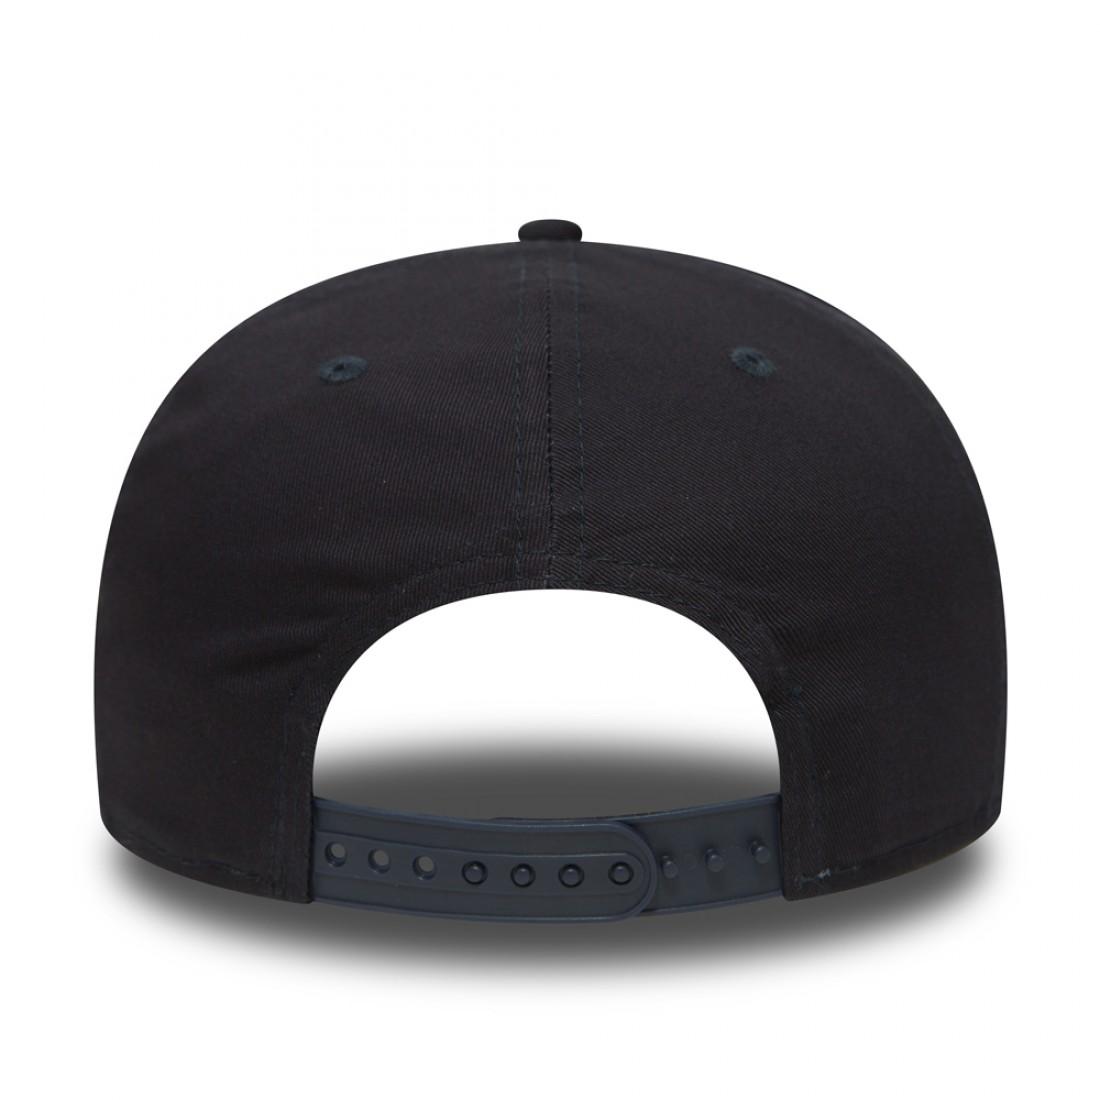 d0ab390263b uk boston red sox baseball cap black 99 00a9a 4a565